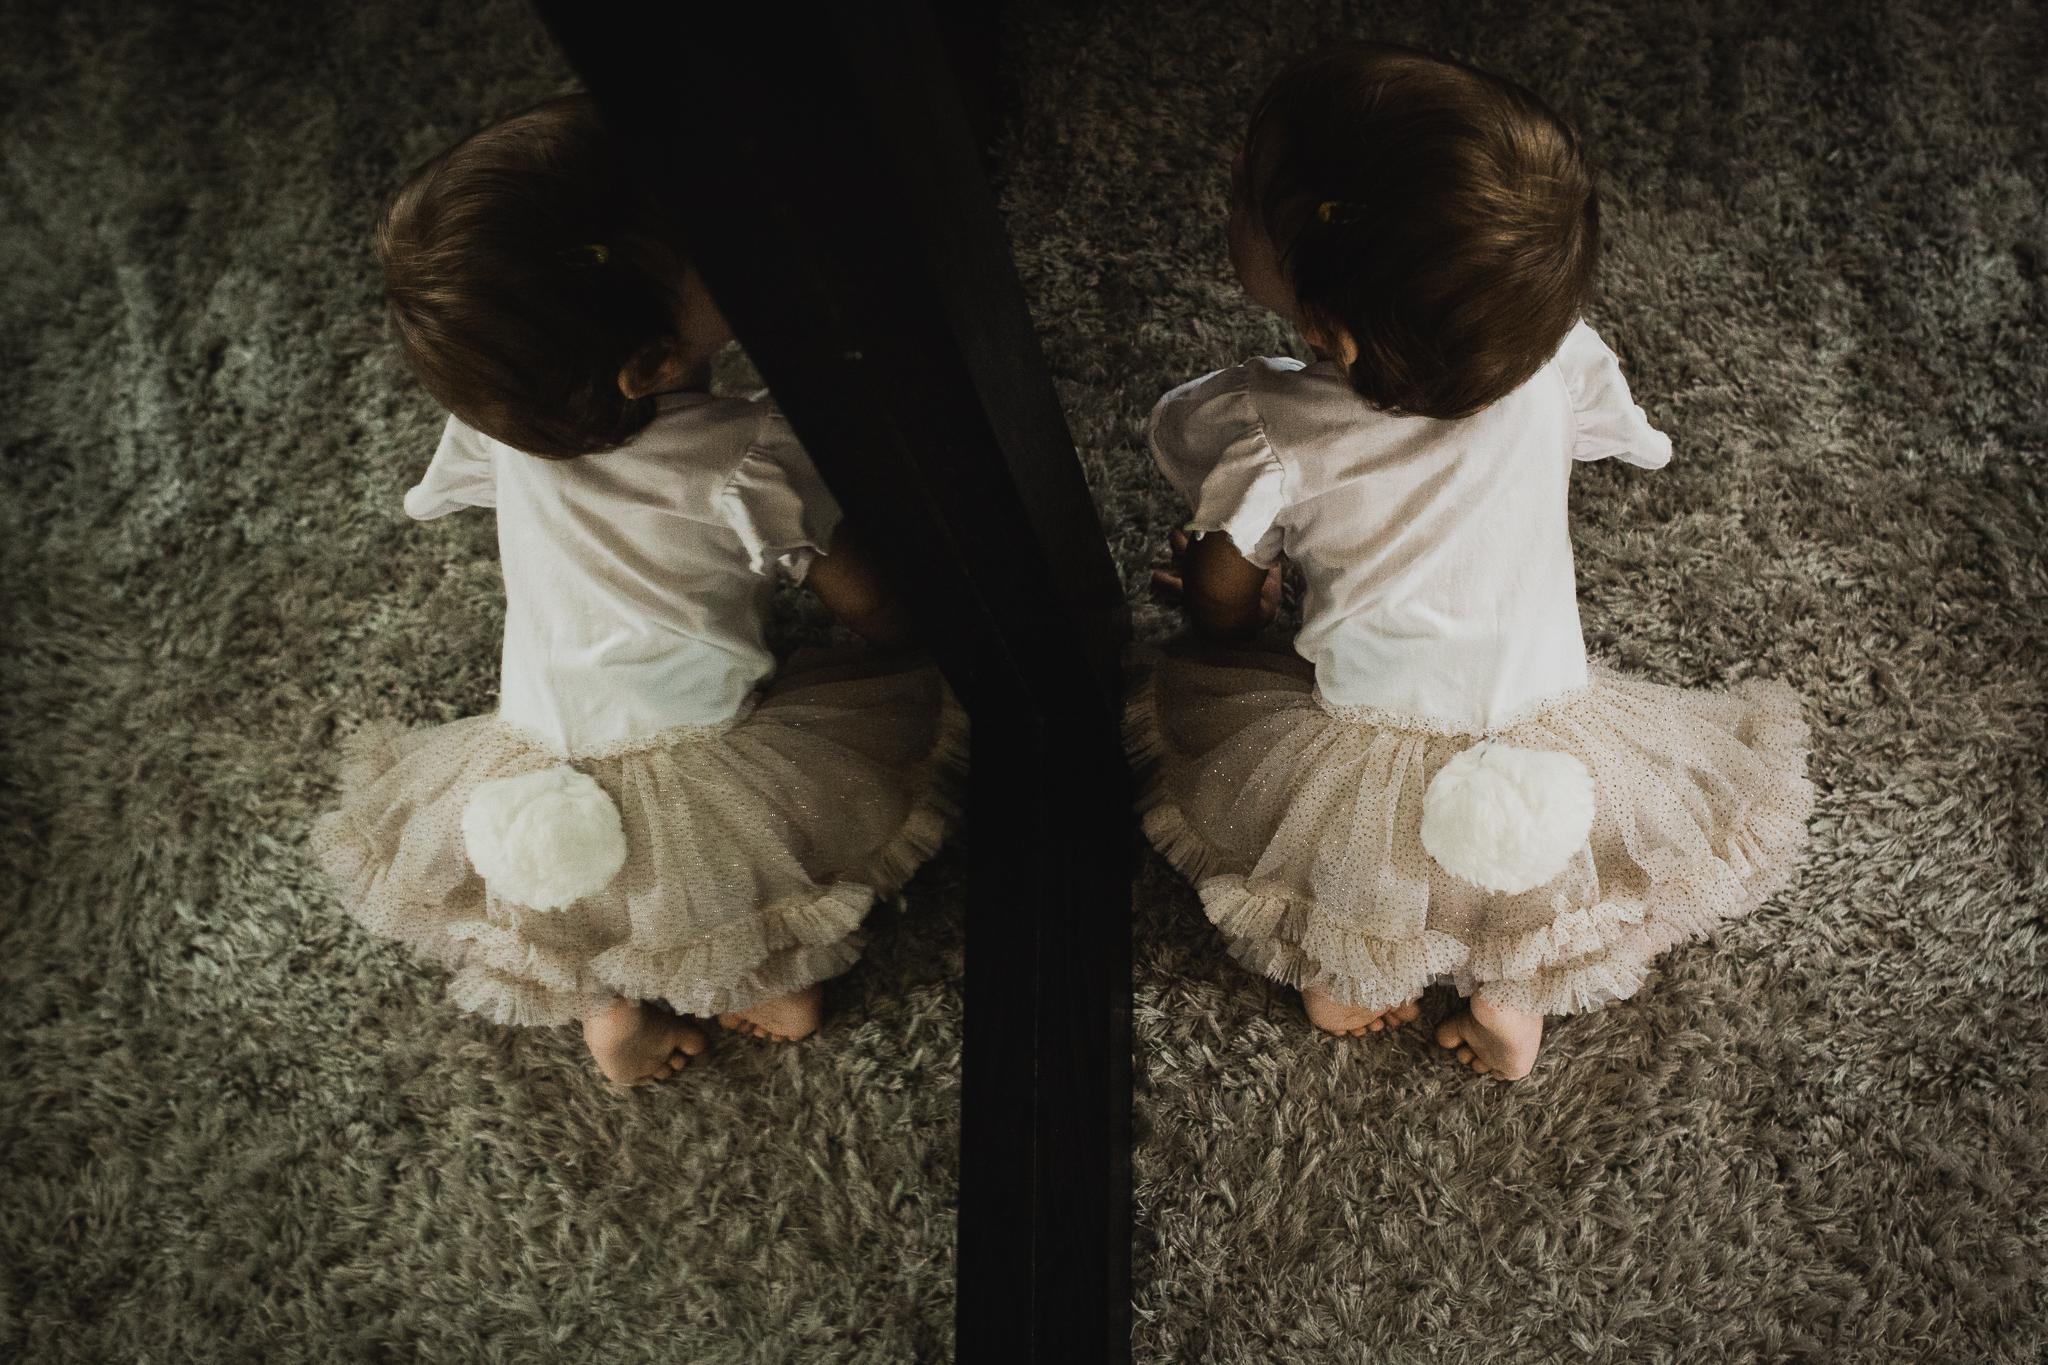 Alina+Joy+Photography+Cold+Lake+Family+Photographer-24.jpg